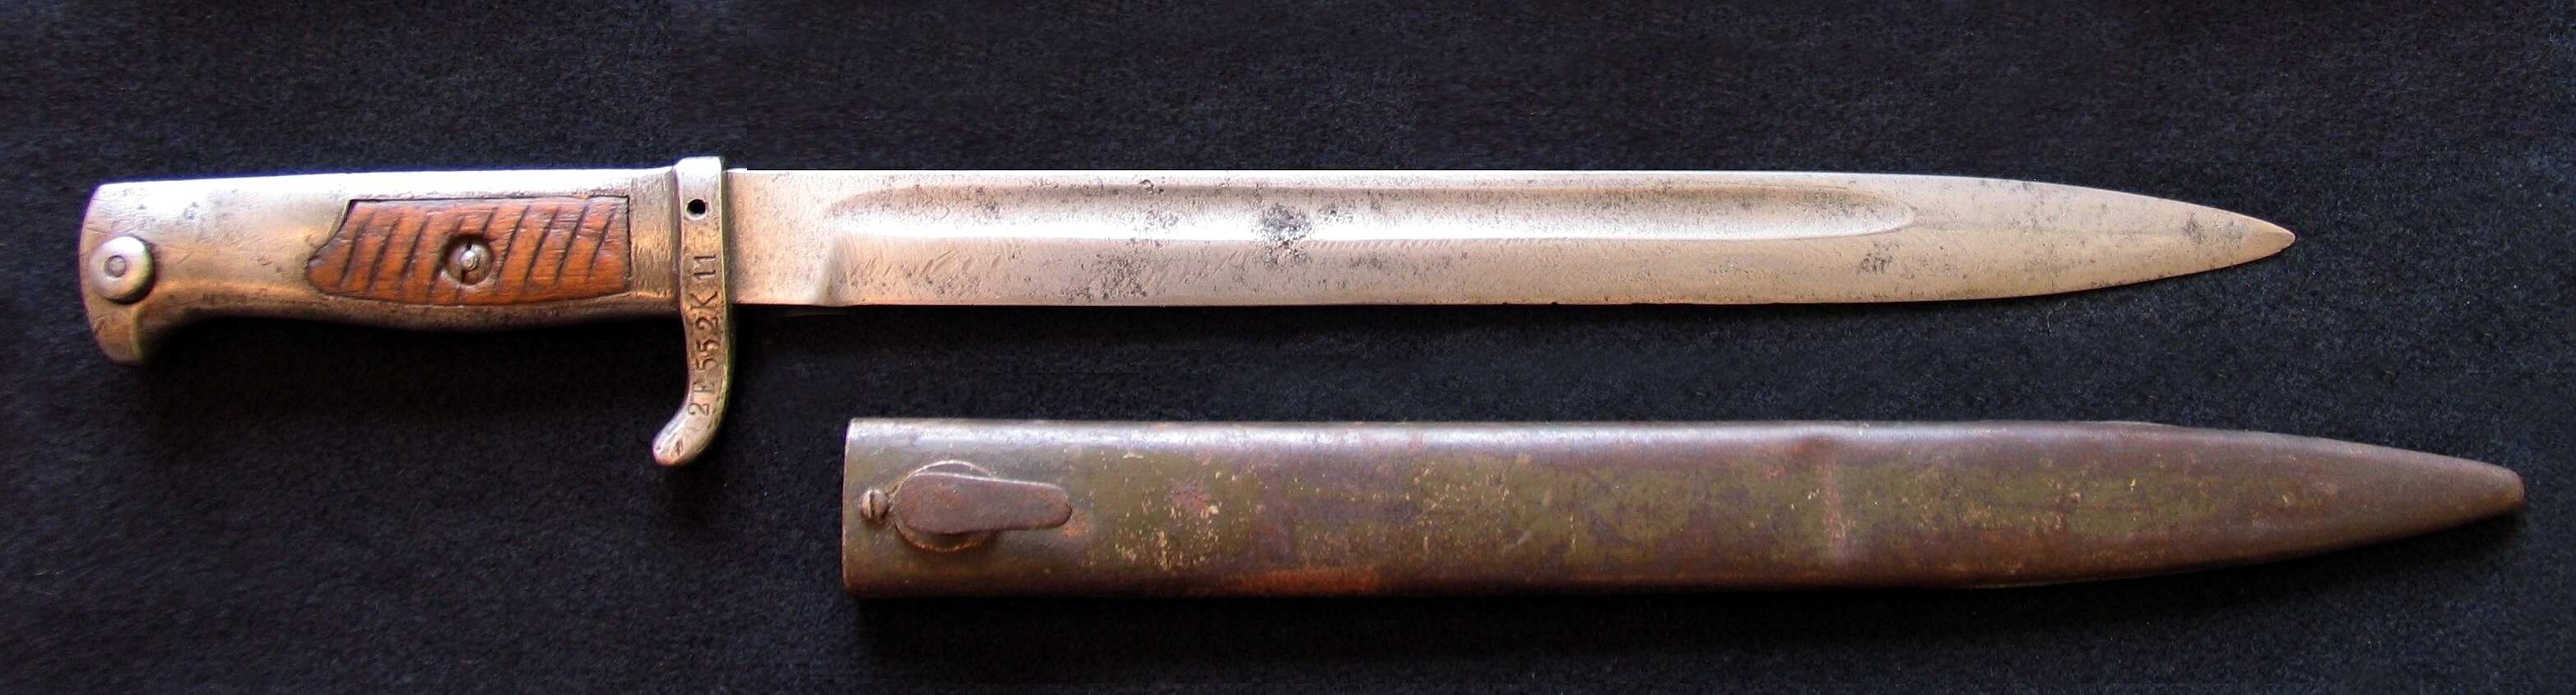 Click image for larger version.  Name:German ersatz bayonets EB55 ~ R1.jpg Views:3 Size:1.74 MB ID:3667199